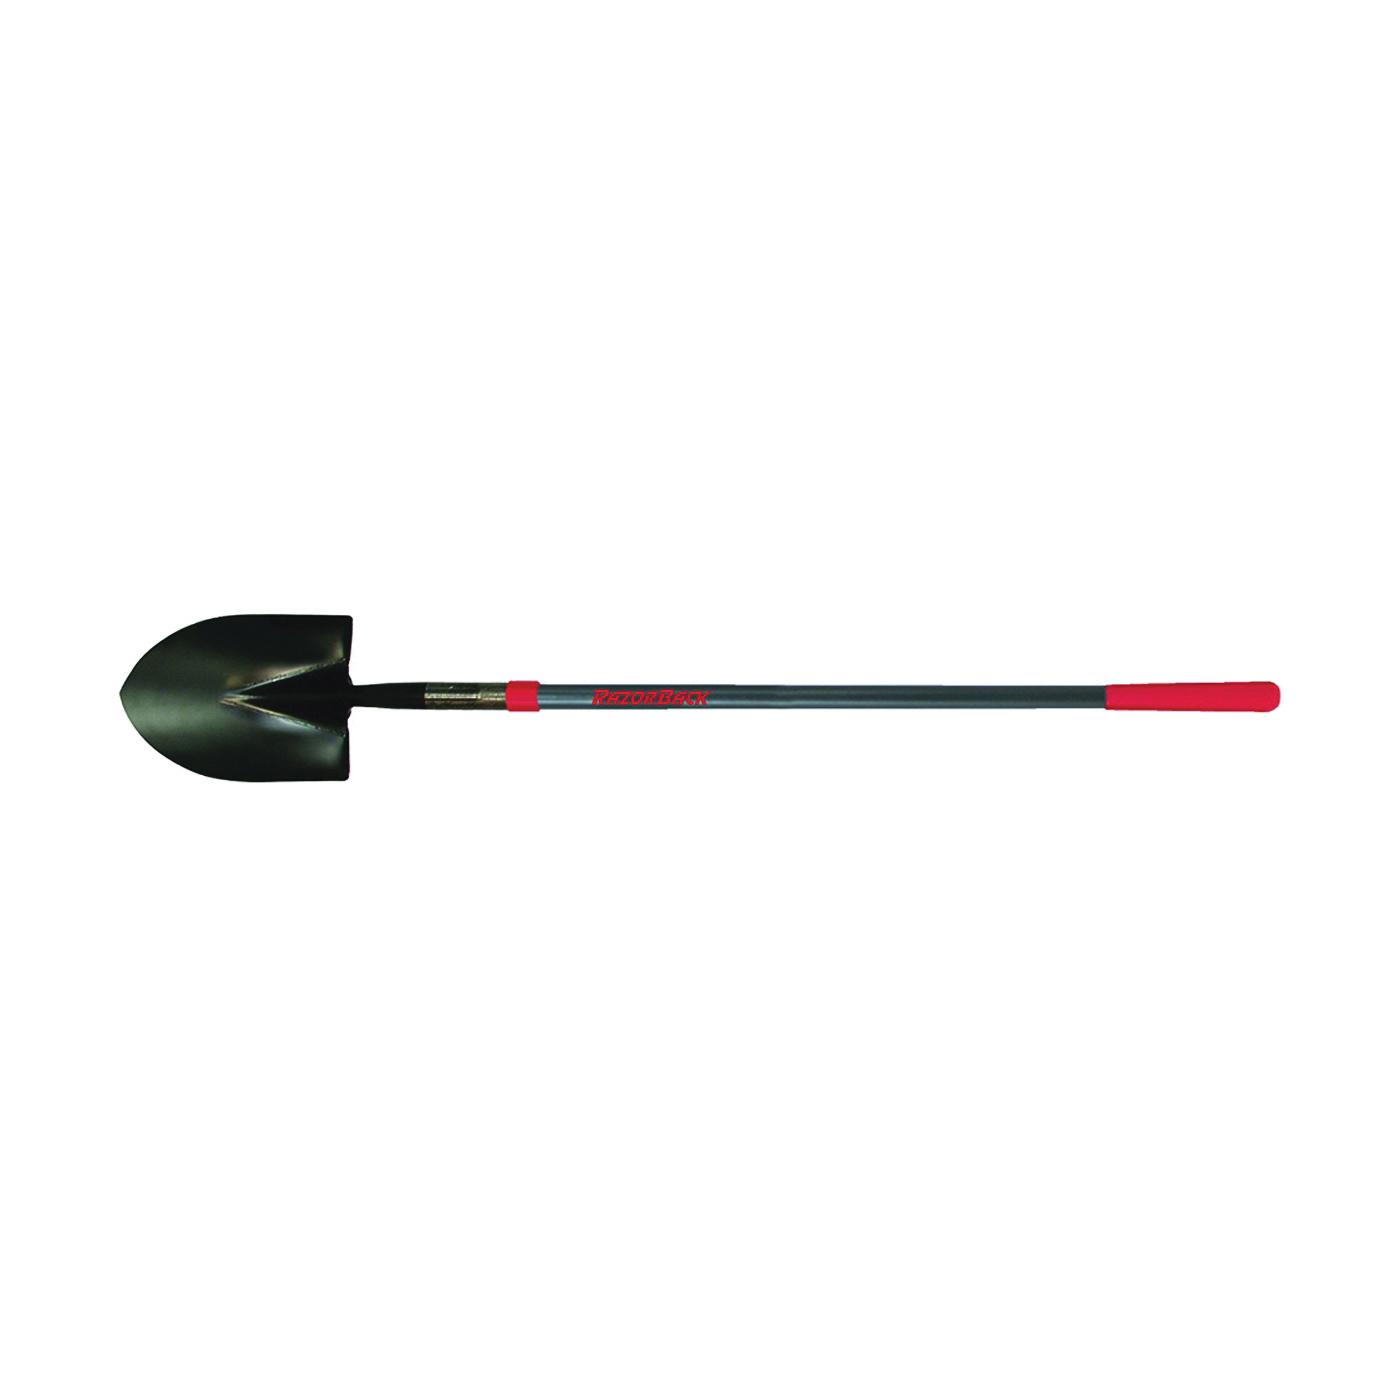 Picture of RAZOR-BACK 45000 Shovel, 8-3/4 in W Blade, Steel Blade, Fiberglass Handle, Long Handle, 48 in L Handle